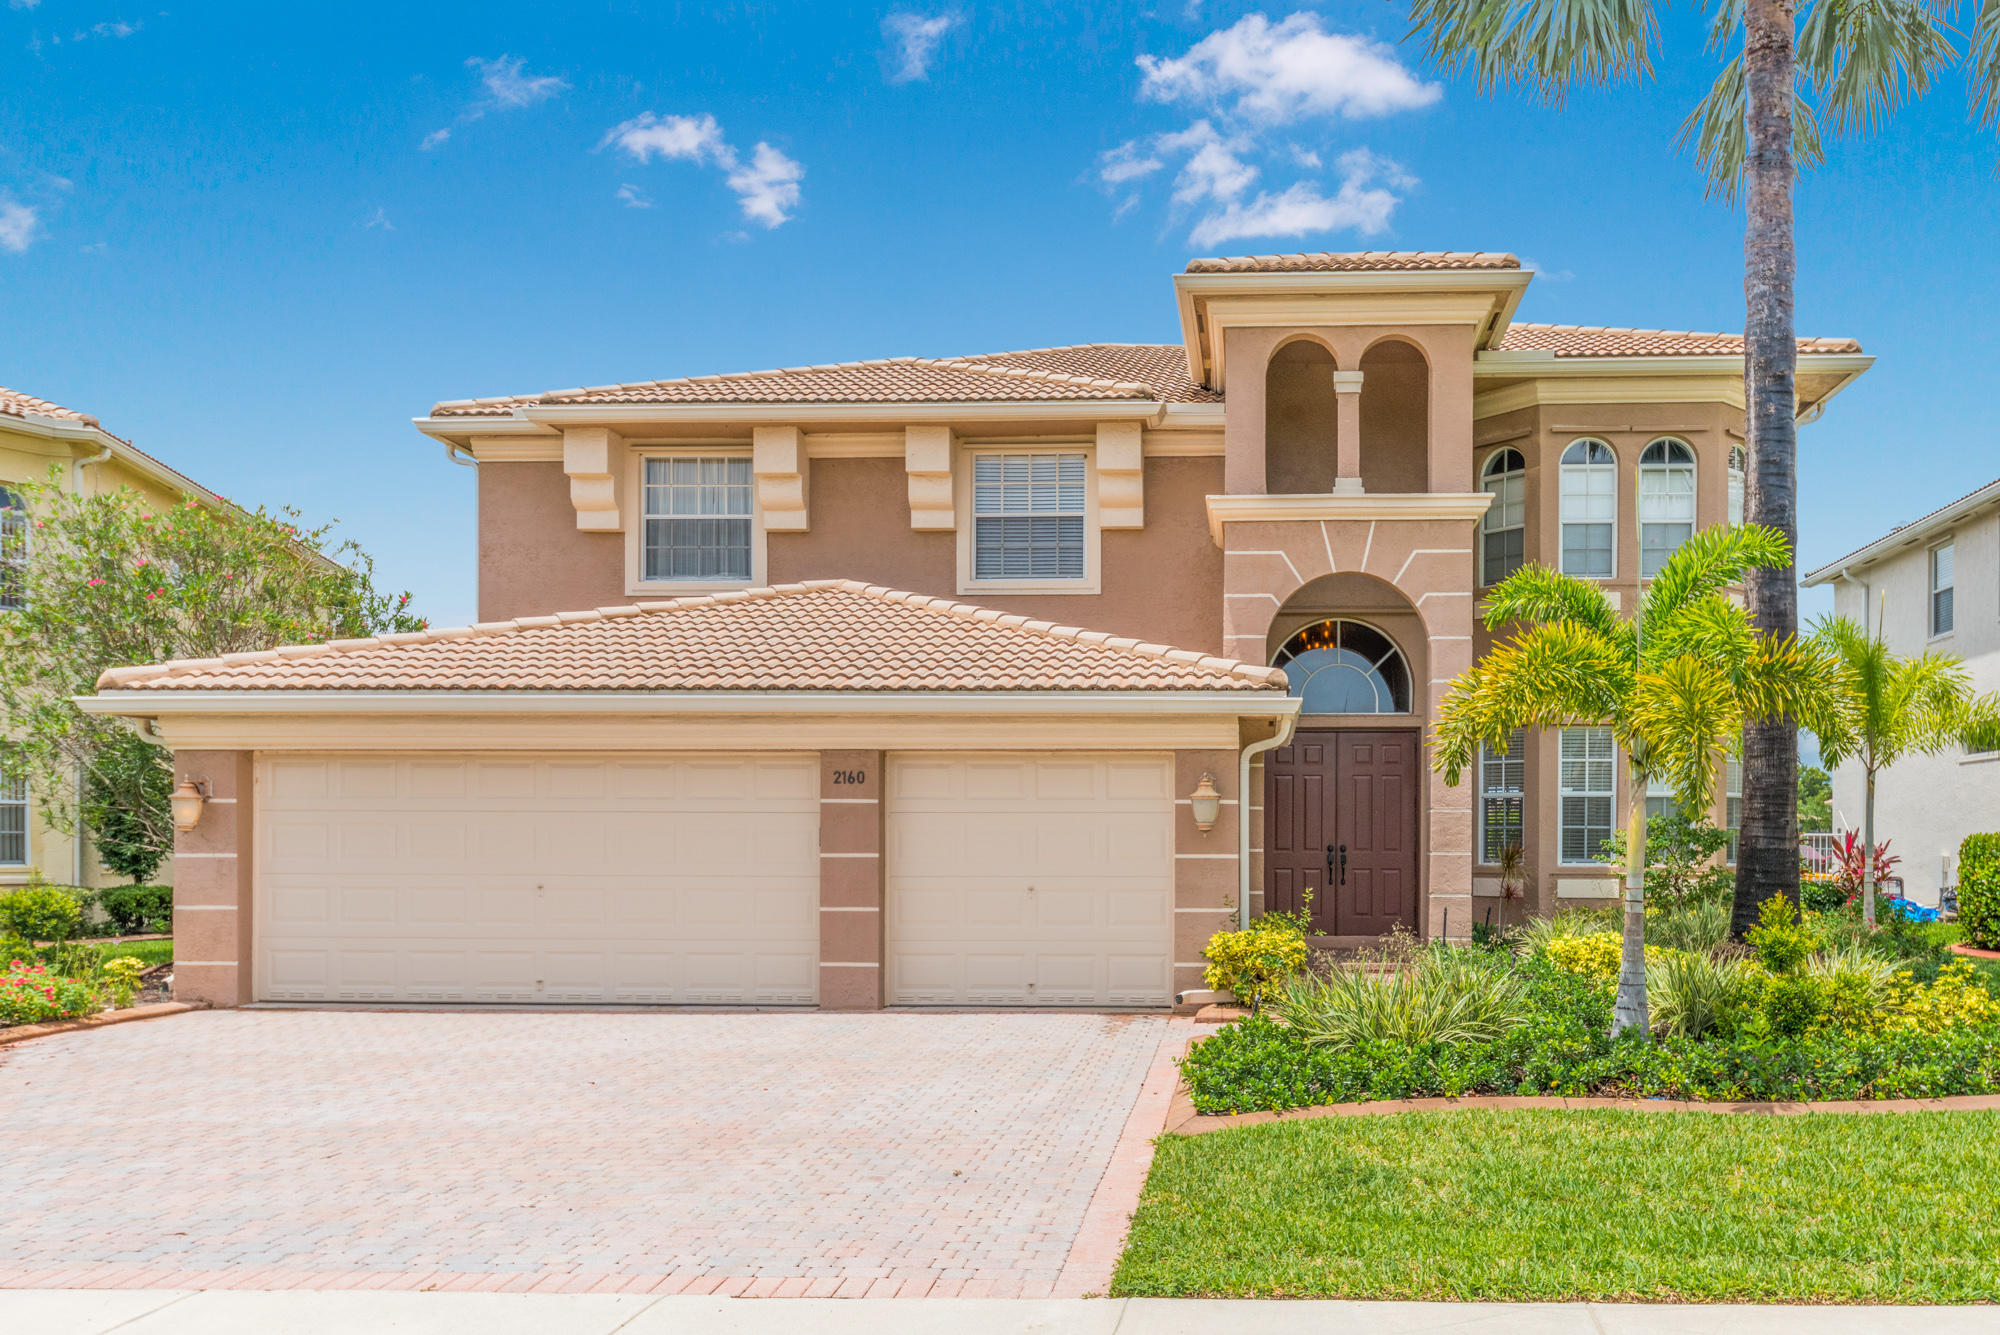 2160 Bellcrest Circle Royal Palm Beach, FL 33411